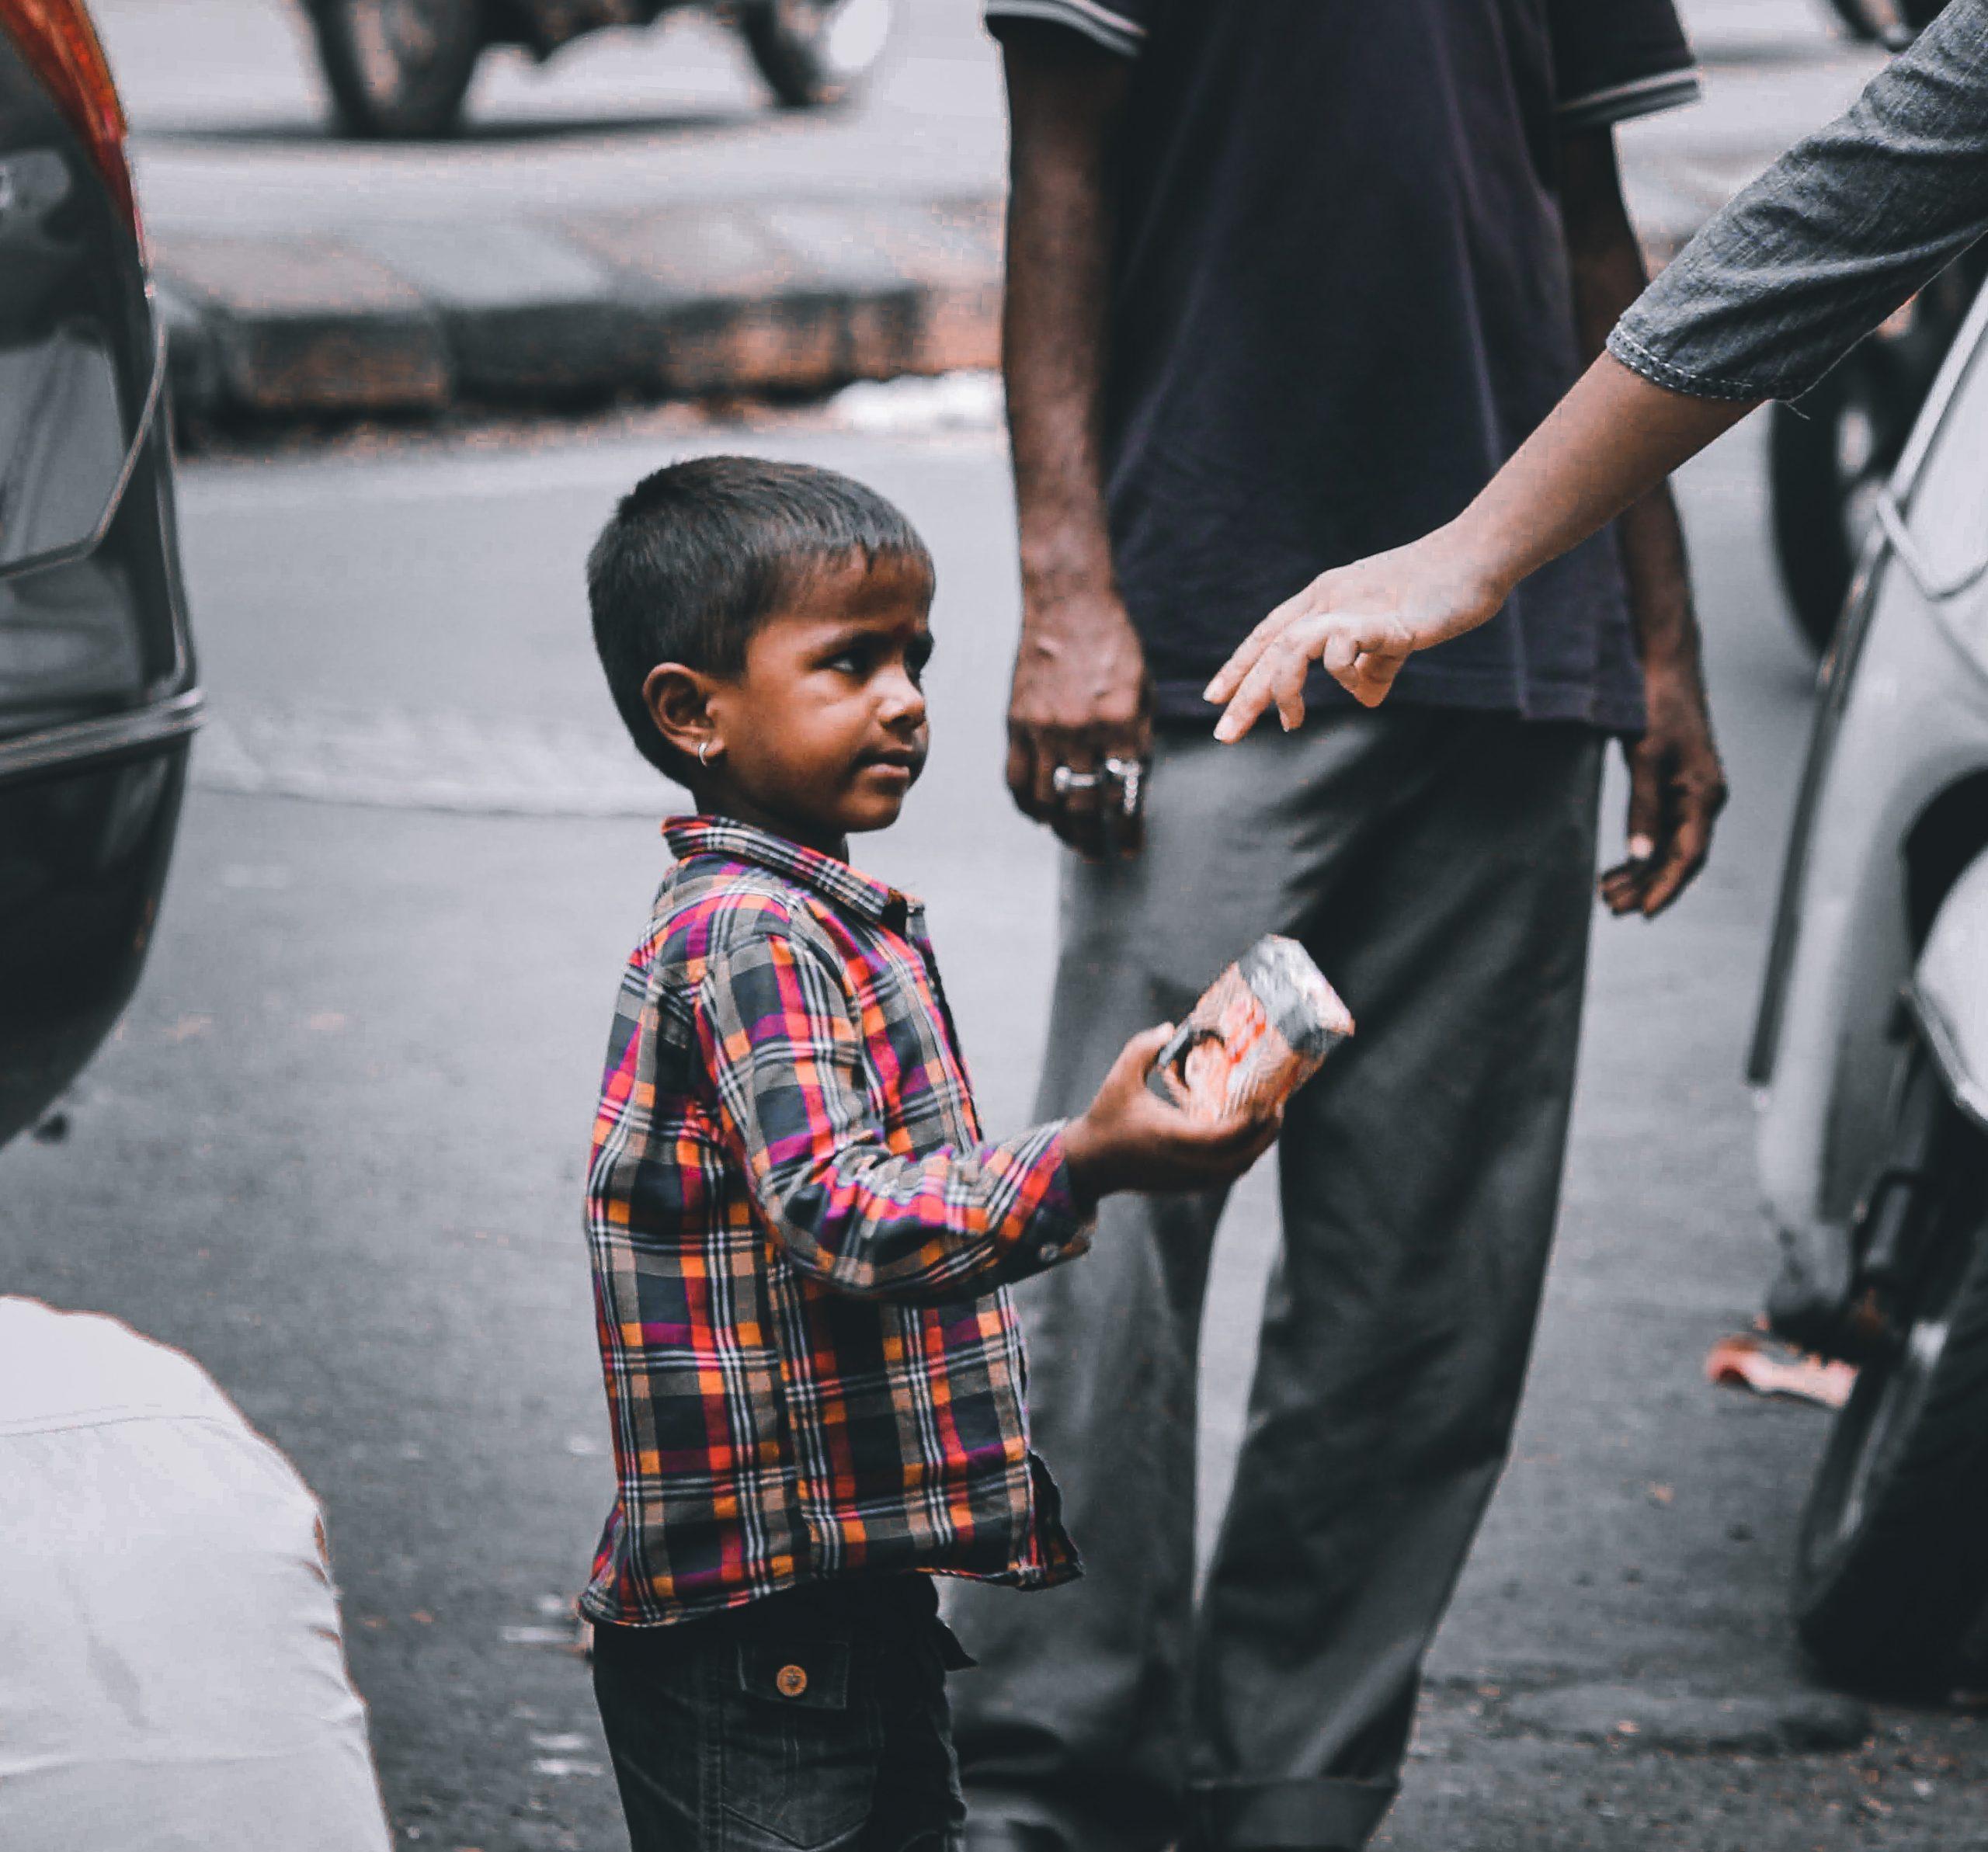 A kid in a street